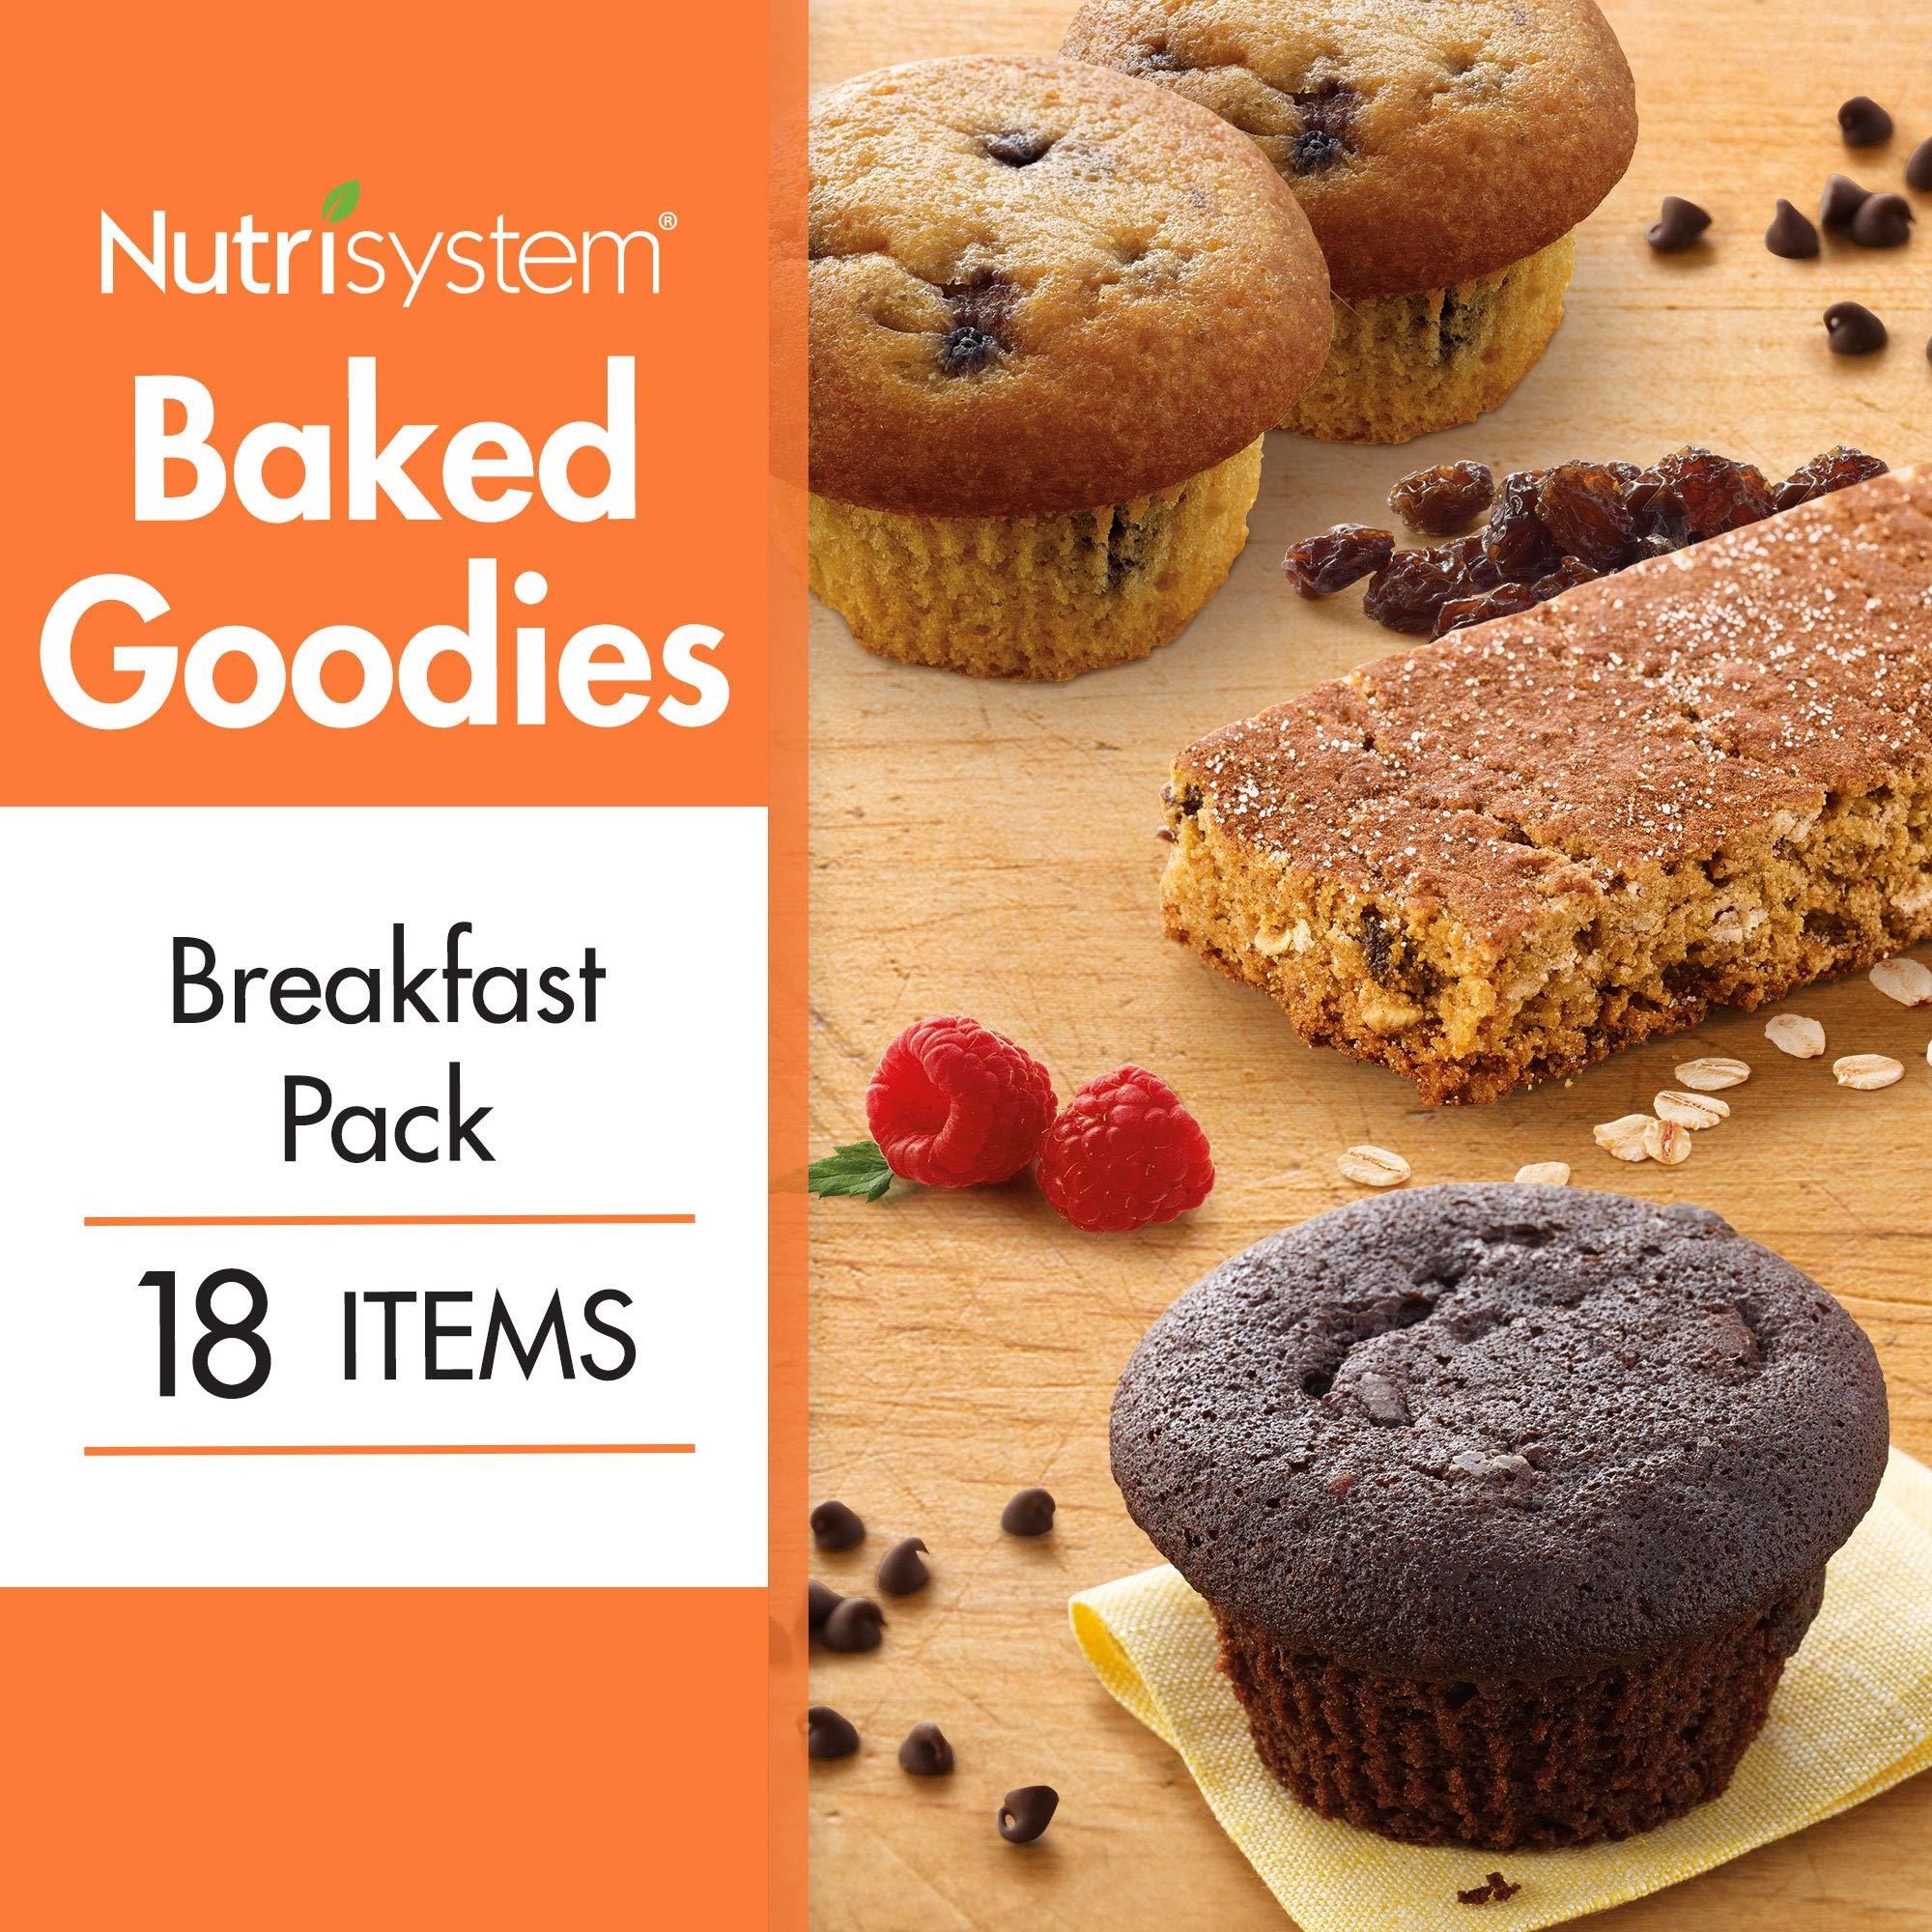 Nutrisystem® Baked Goodies Breakfast Bundle 18CT by Nutrisystem